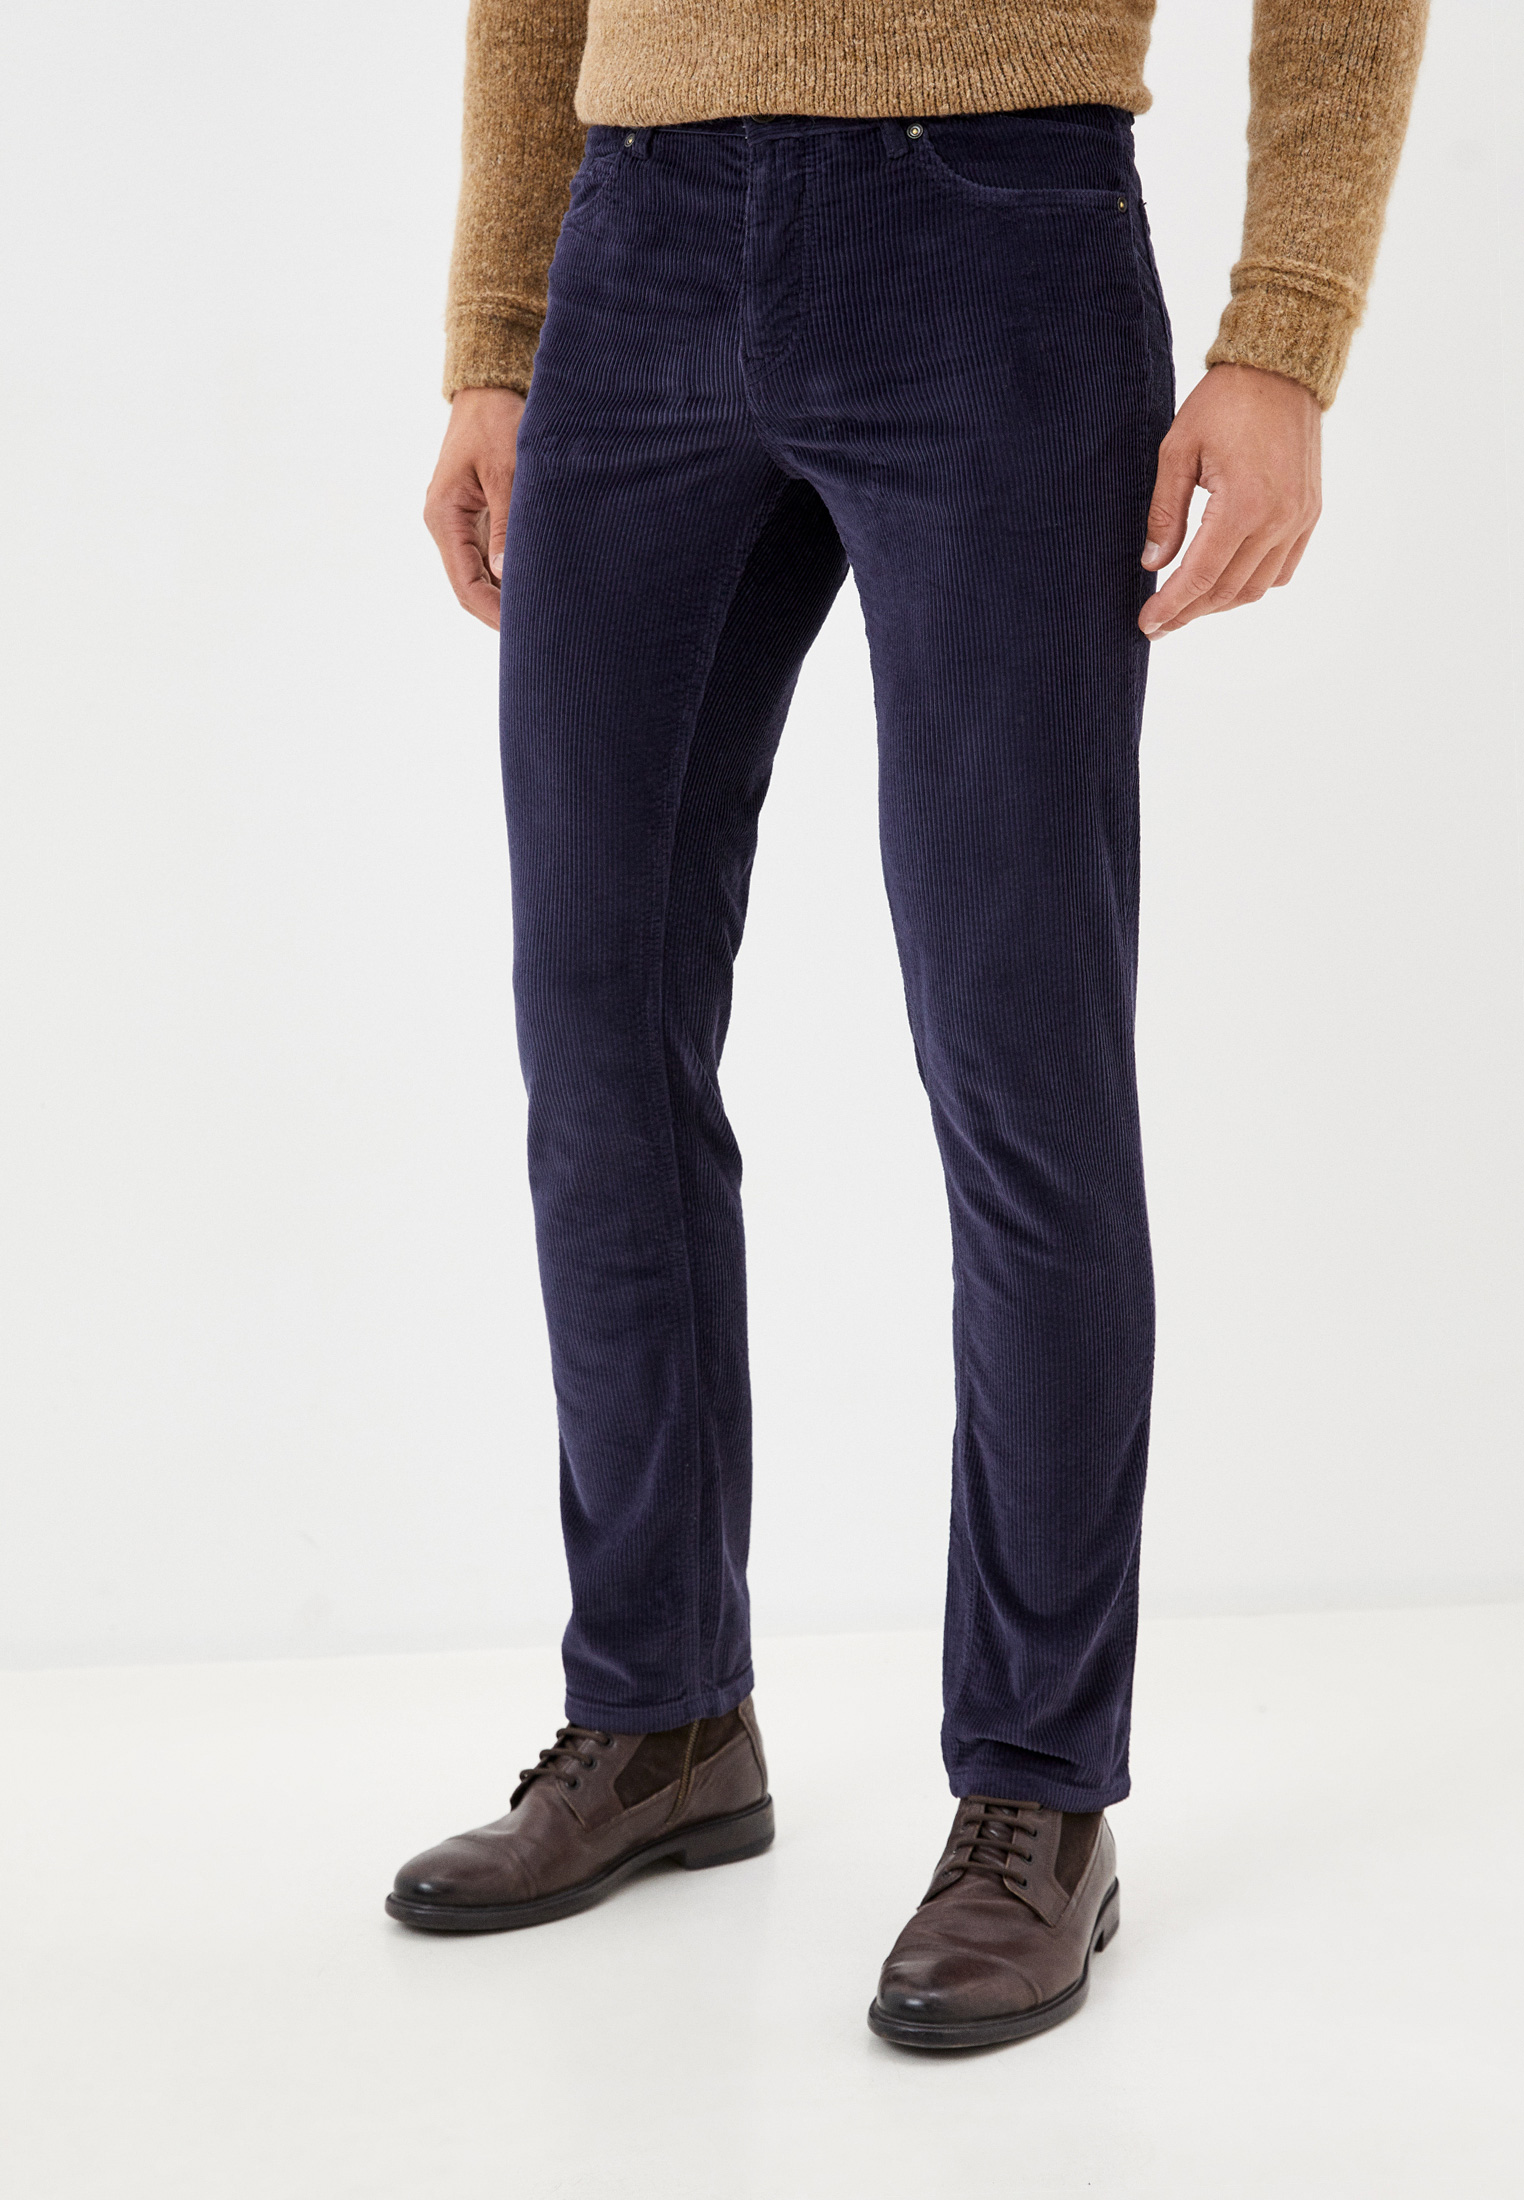 Мужские повседневные брюки United Colors of Benetton (Юнайтед Колорс оф Бенеттон) 4ALR57BX8